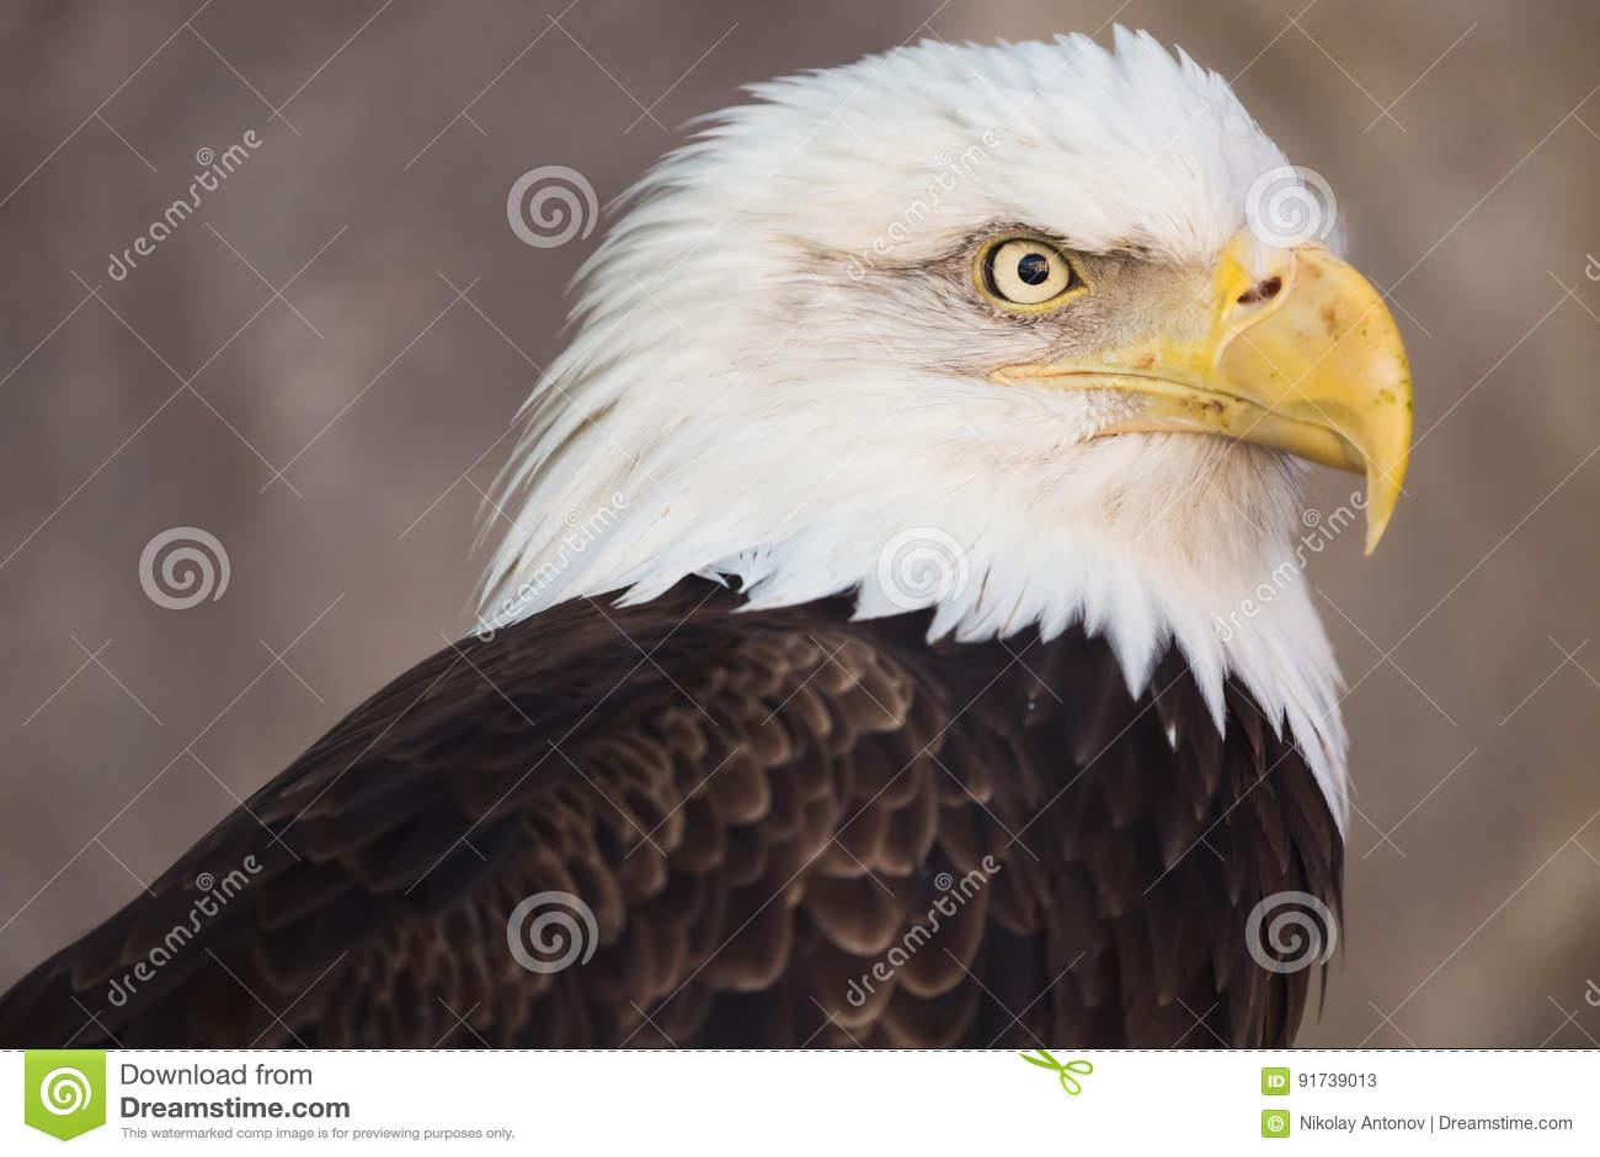 Portrait Of A Bald Eagle America National Symbol Latin Name